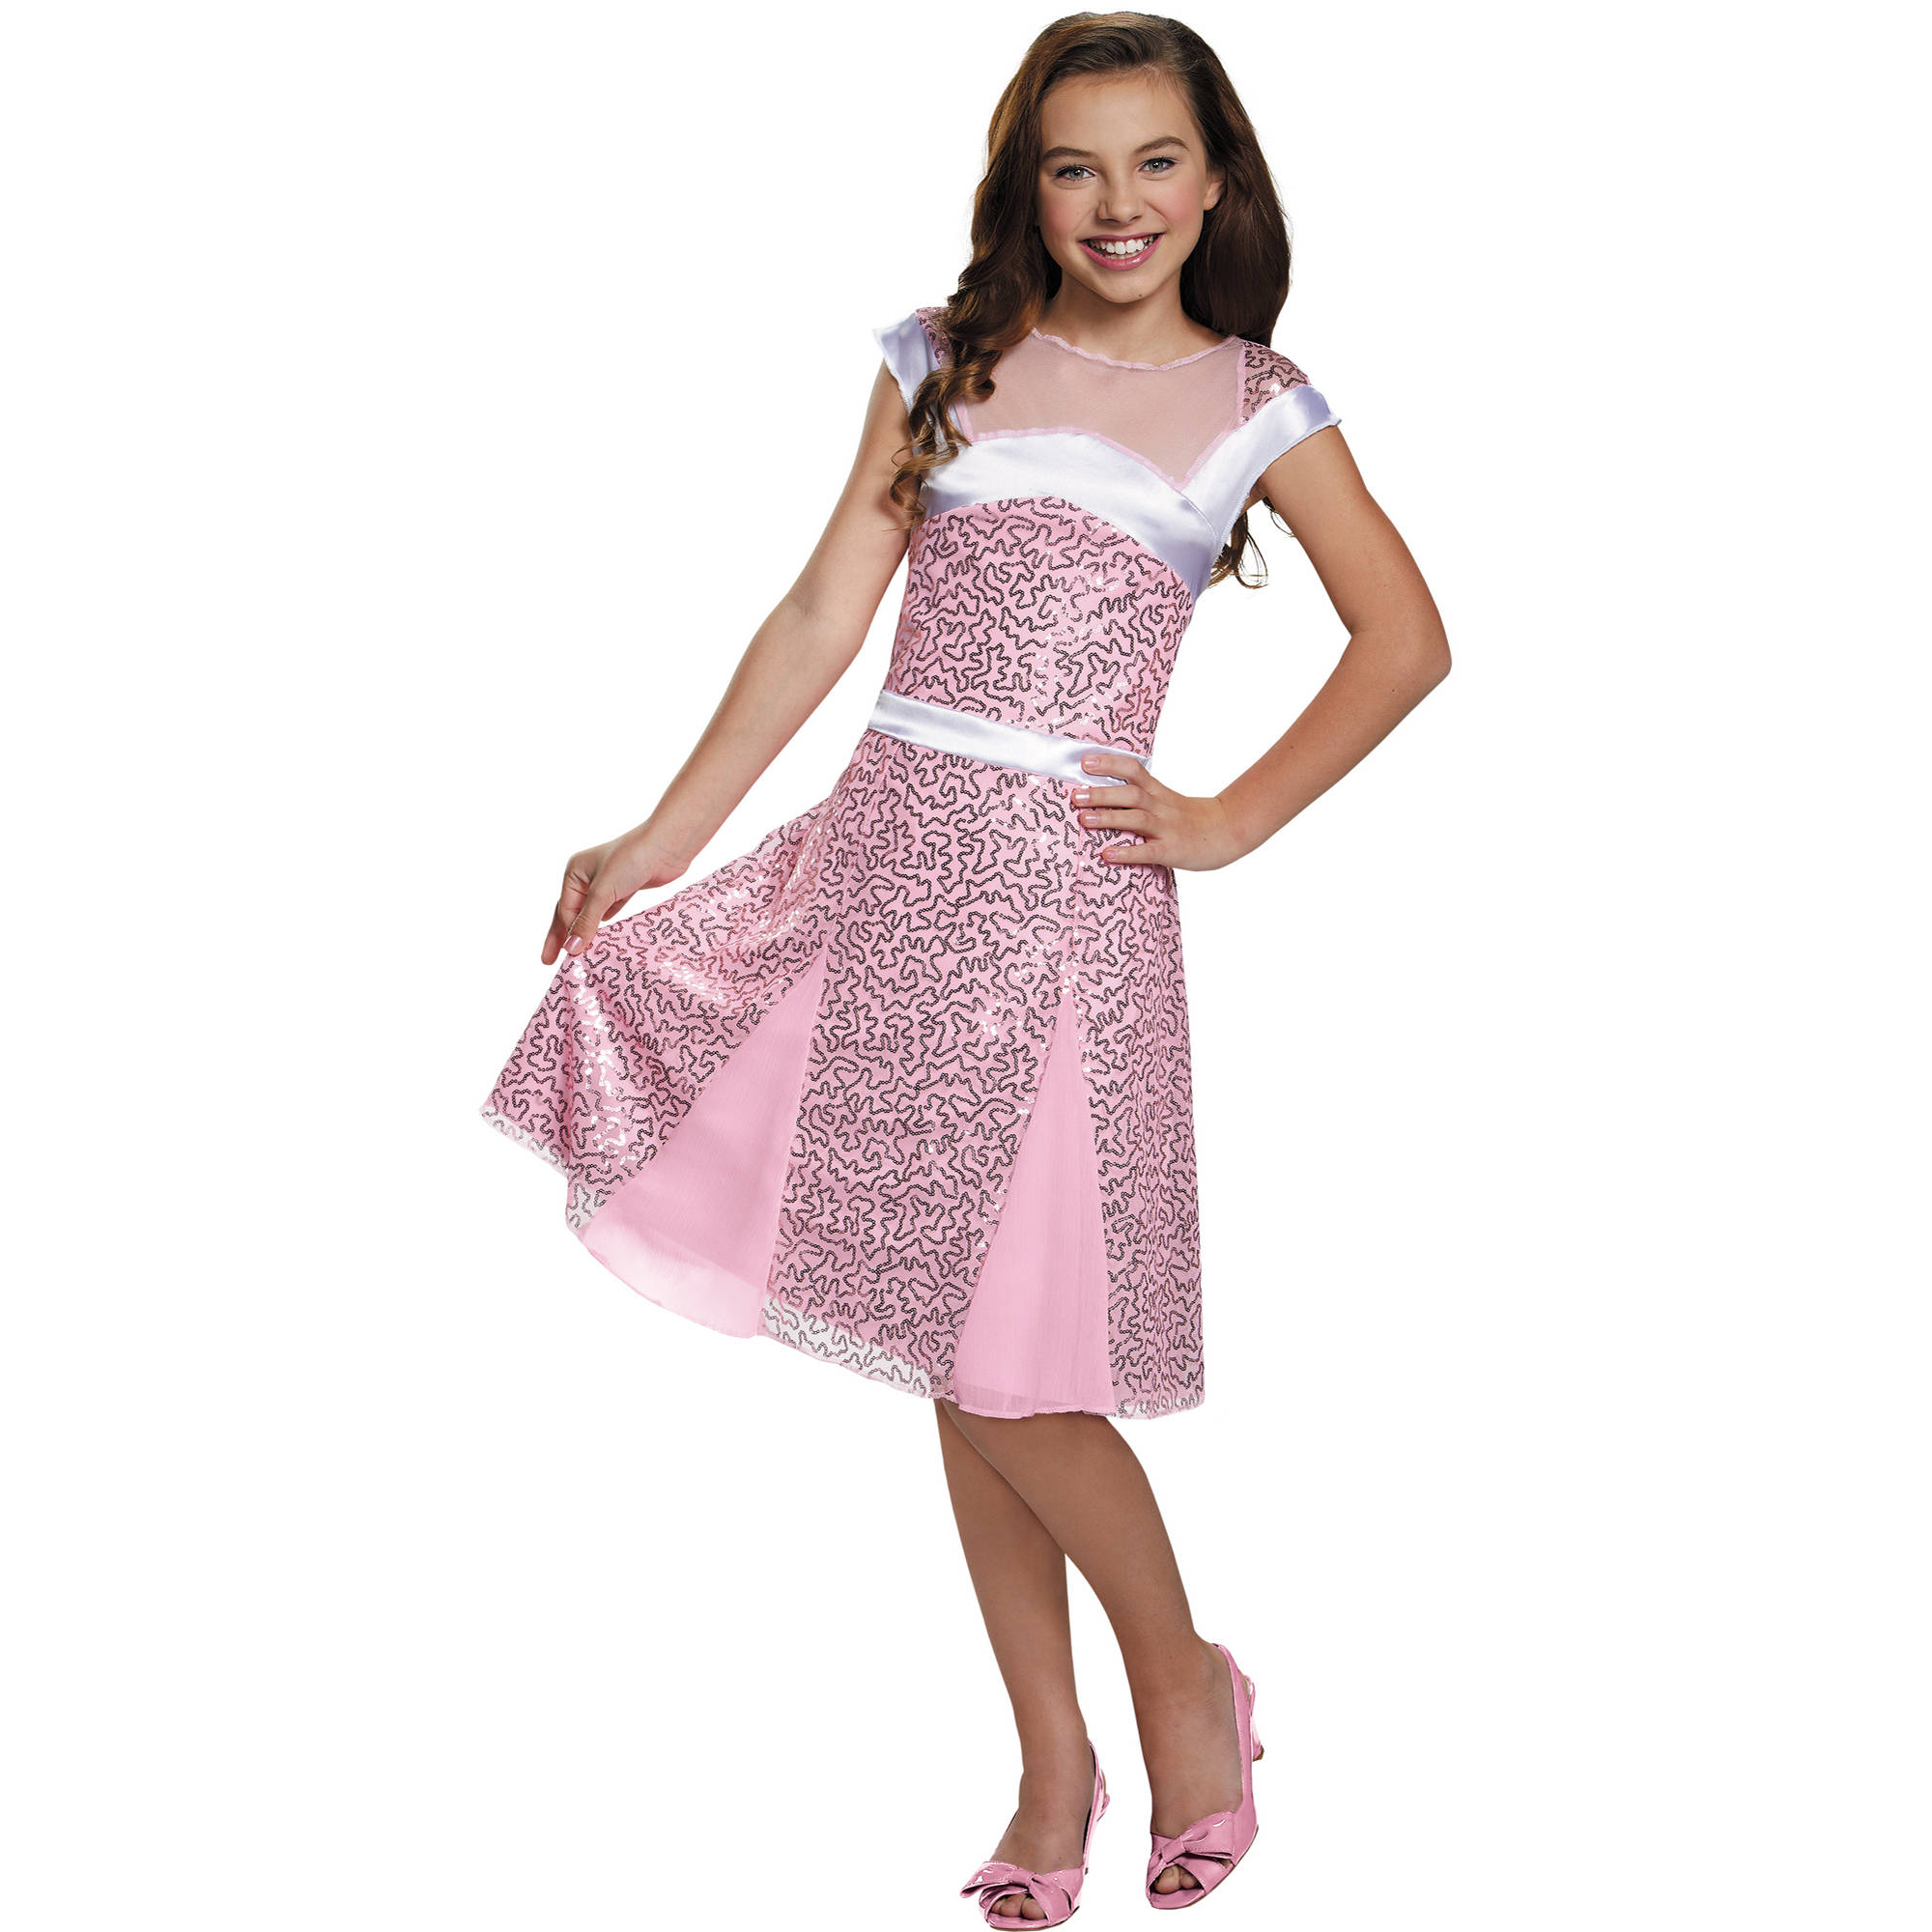 Audrey Coronation Deluxe Child Halloween Costume